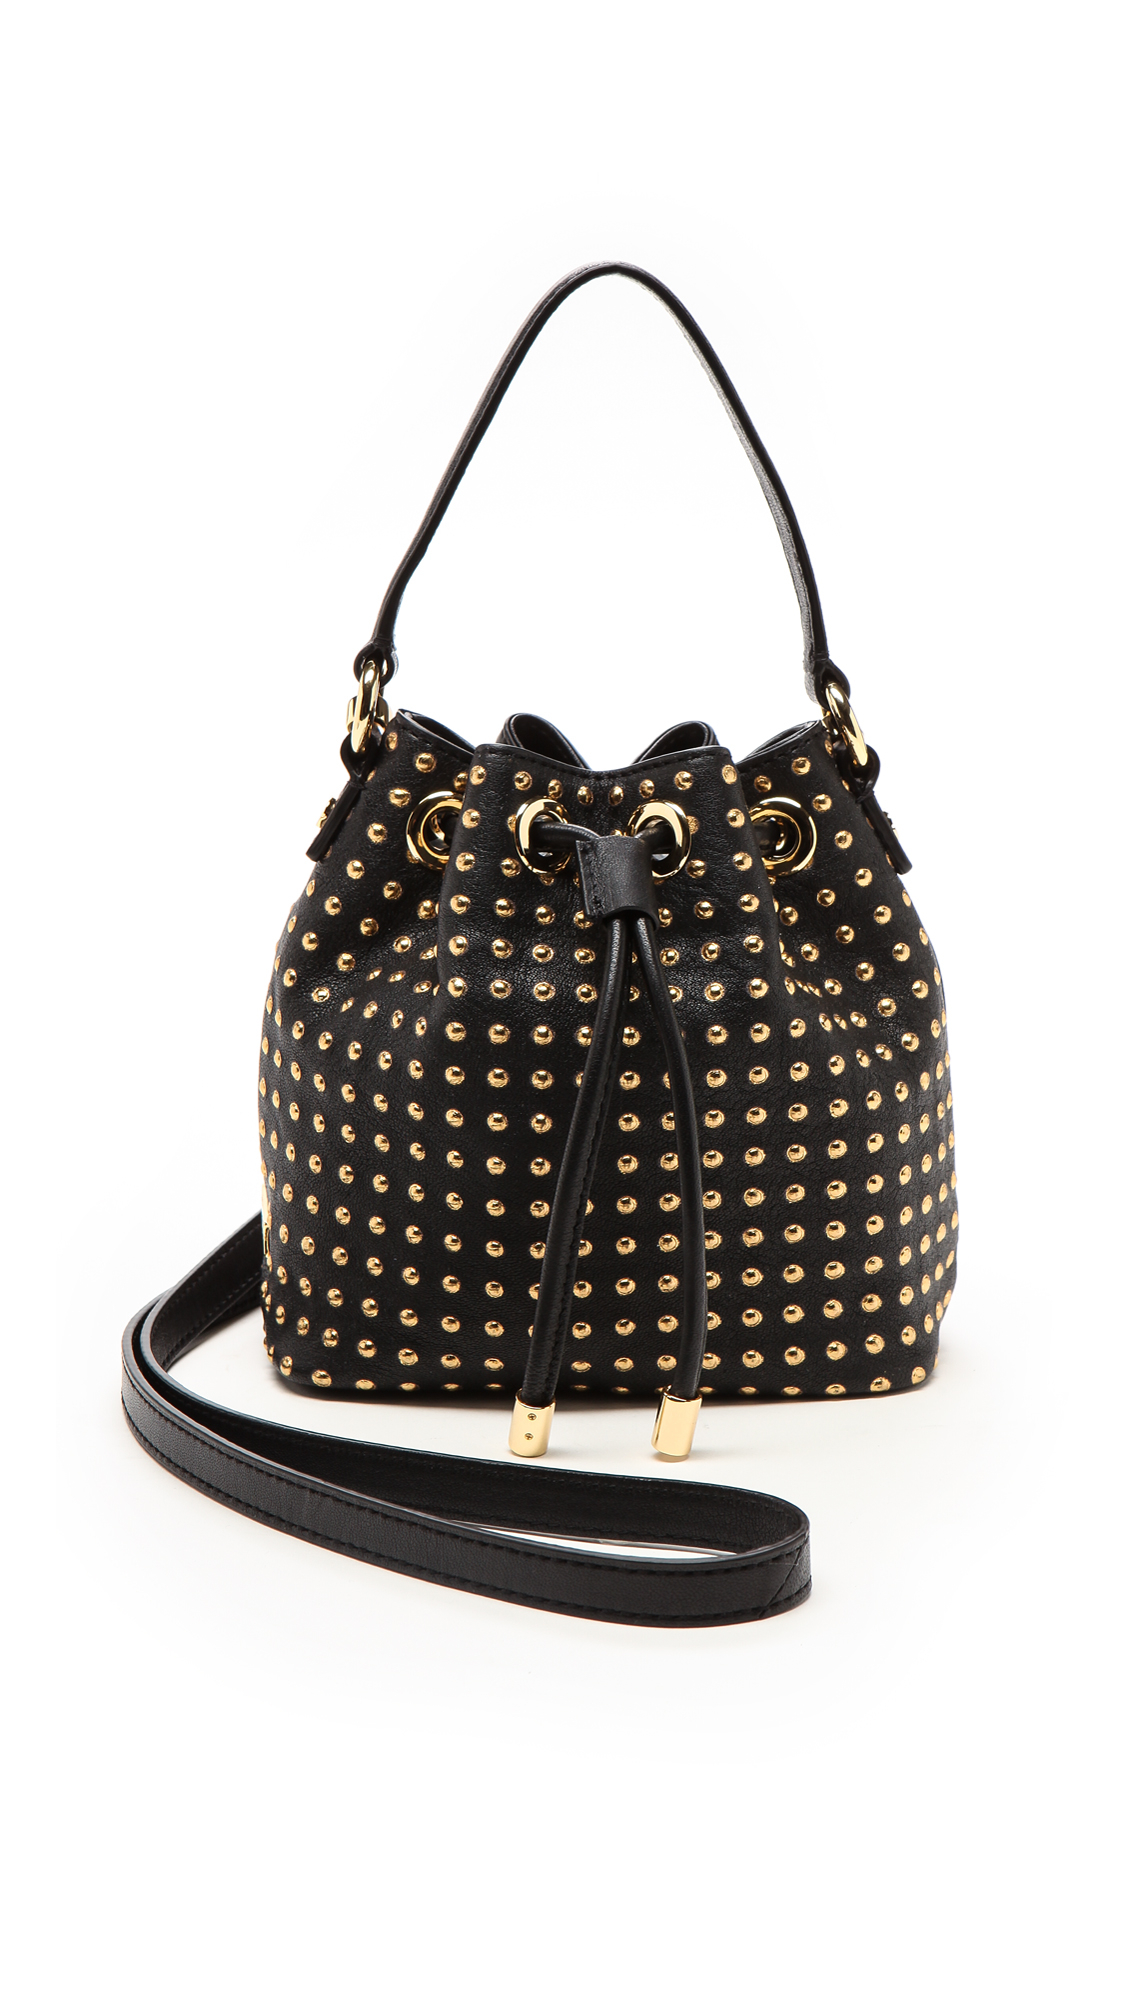 89f1d049de4e Lyst - MILLY Perry Dot Mini Drawstring Bag - Blackgold in Metallic